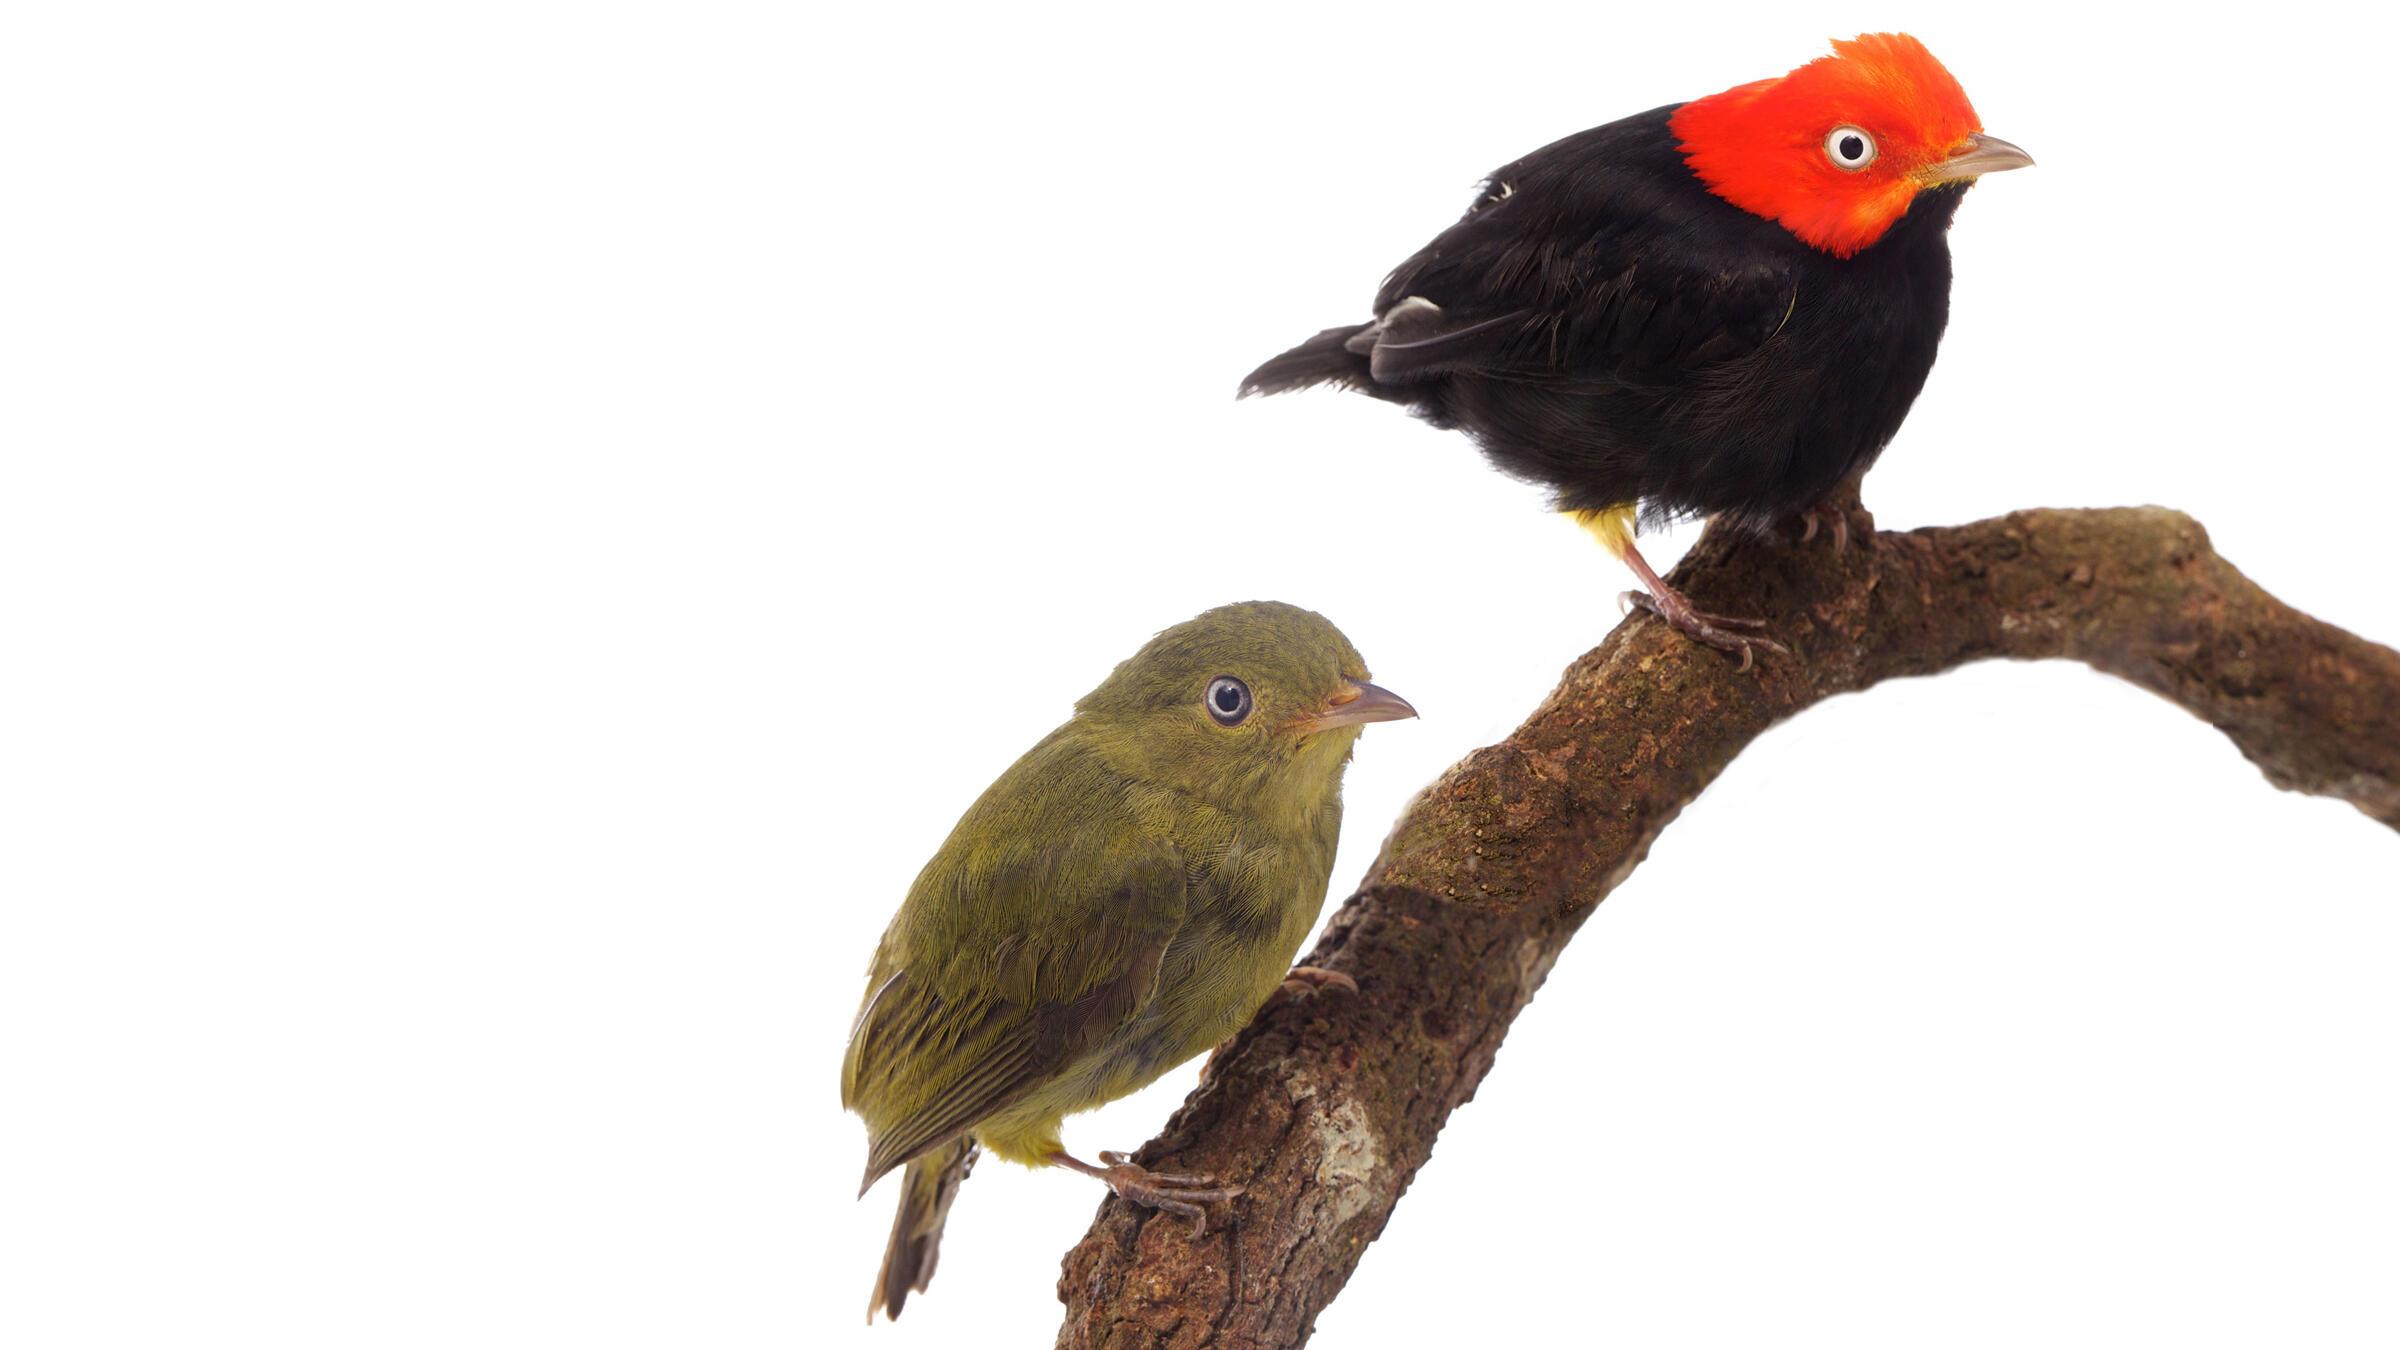 Red-capped Manakins, female (L) and male (R). Sean Graesser